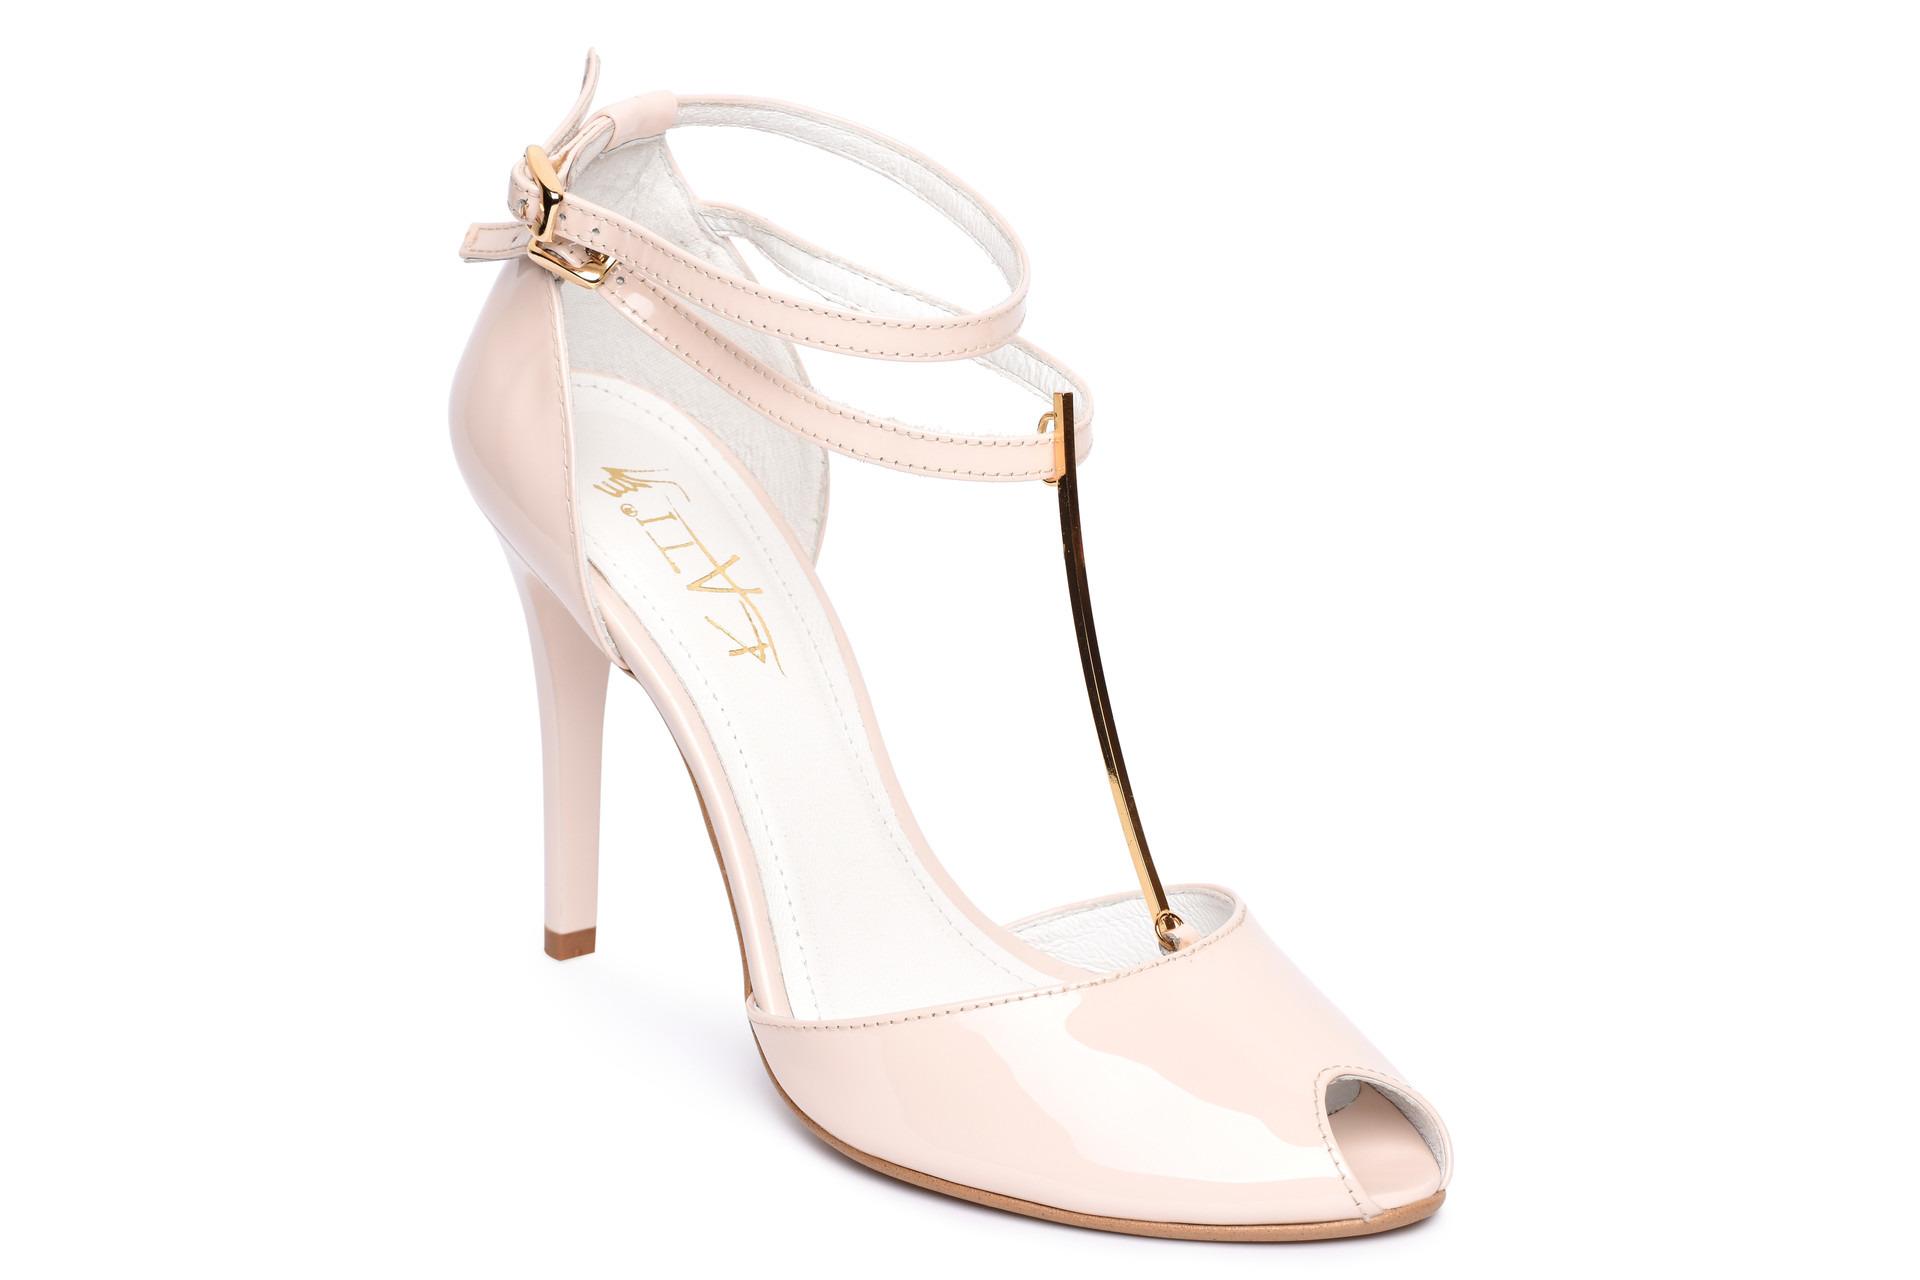 edcafb527c1a GALLERY SHOES - Sandále - Sandále púdrove lakové s pevnou pätou KATI